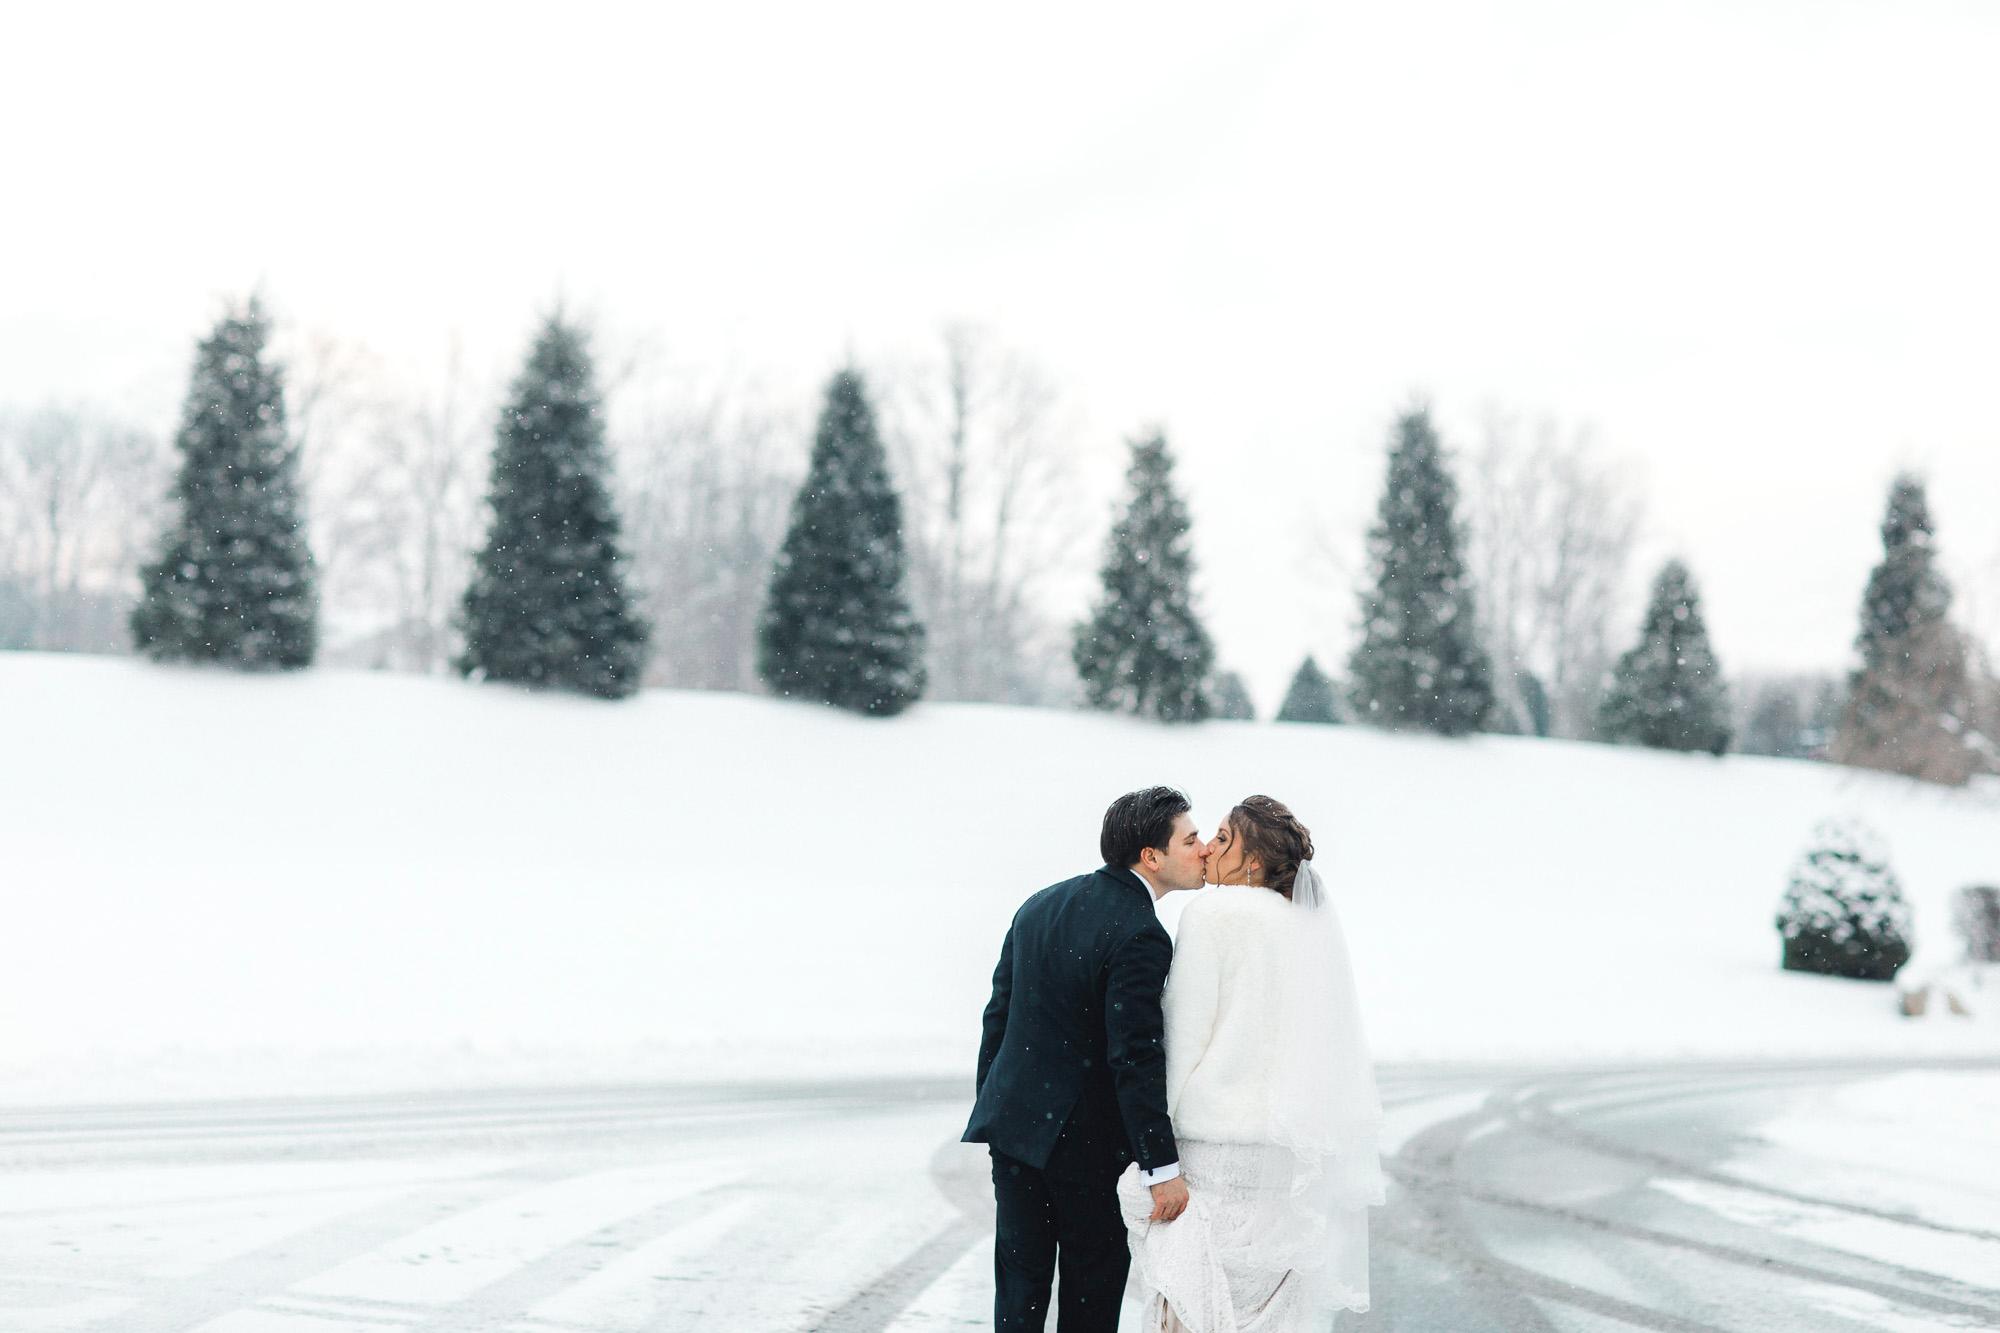 snowy-sand-springs-country-club-drums-pa-christmas-wedding-24728.jpg